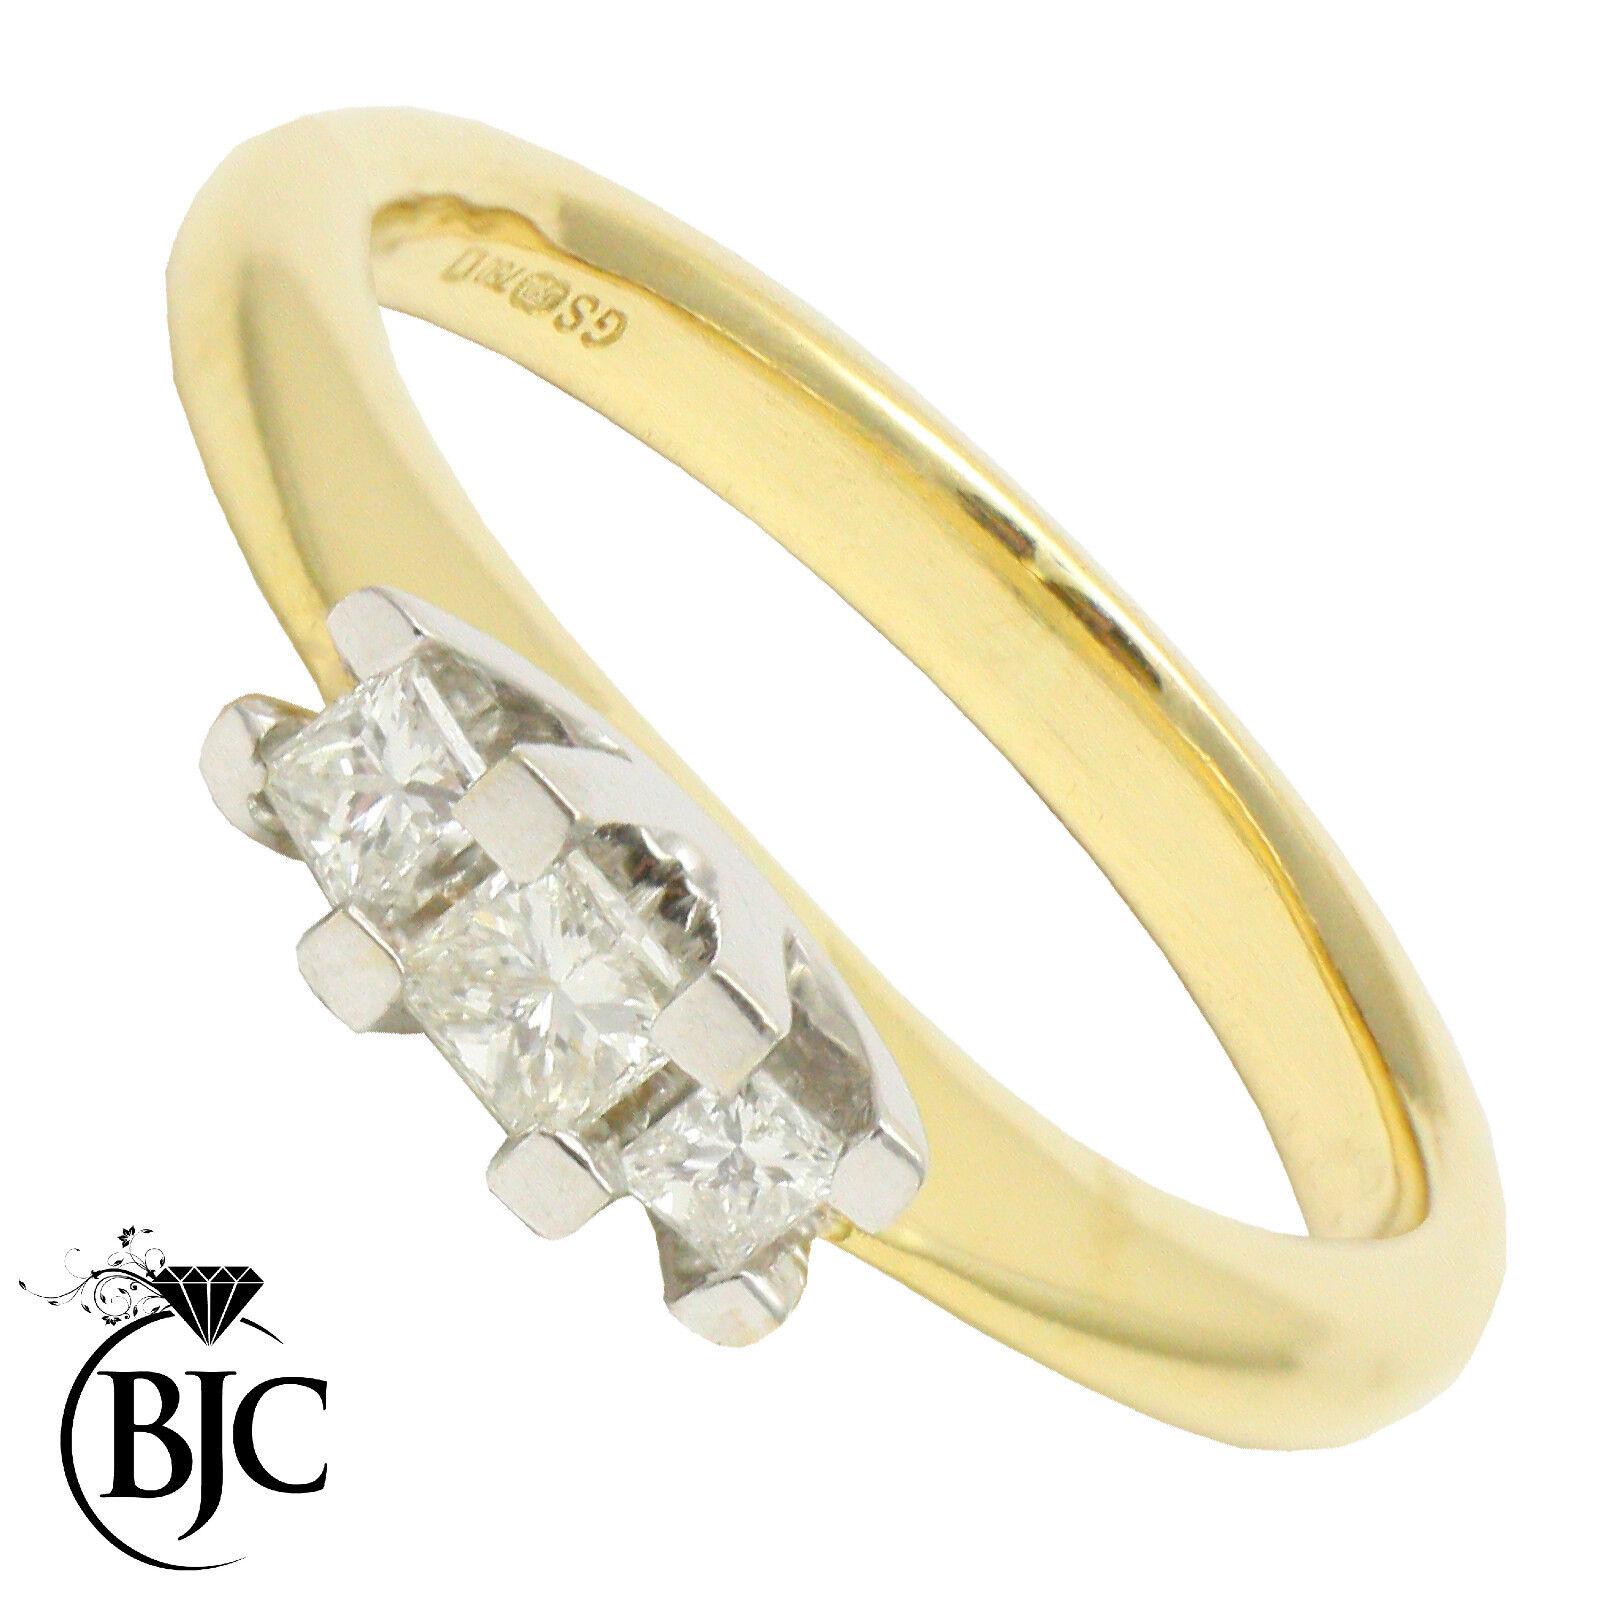 BJC® 18ct yellow gold Diamond 0.35ct Trilogy size L engagement dress ring R86